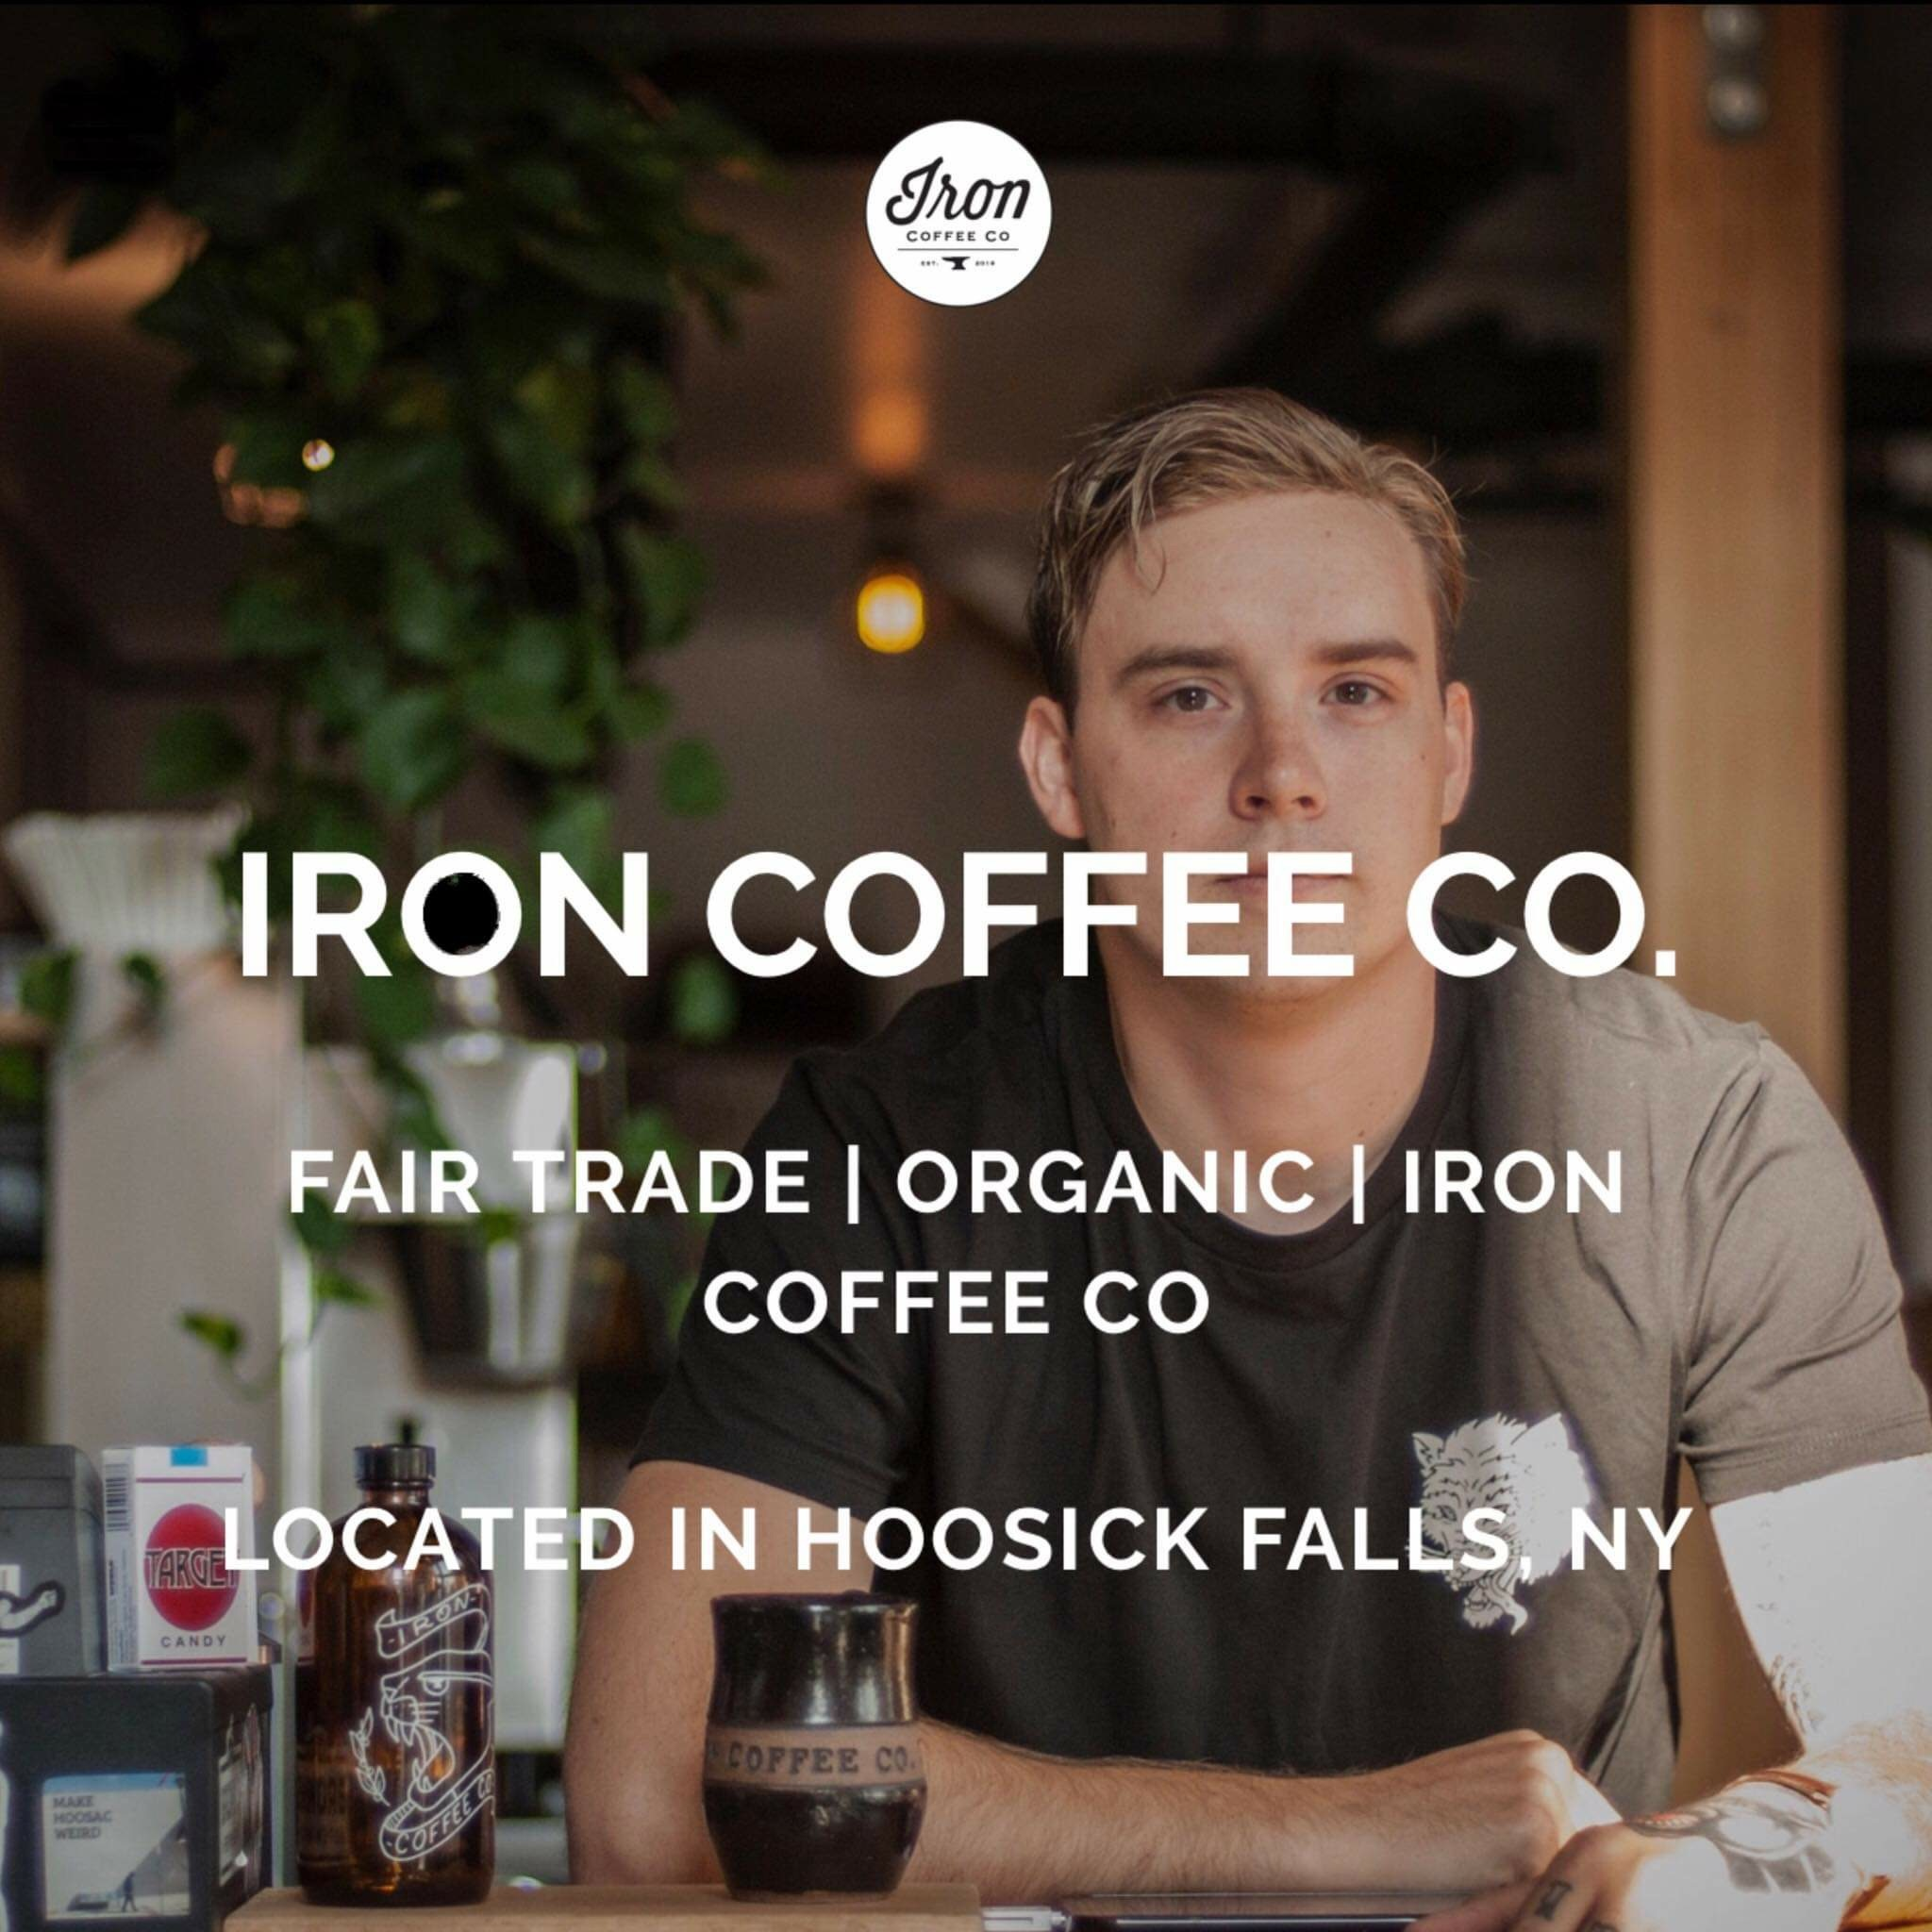 Iron Coffee